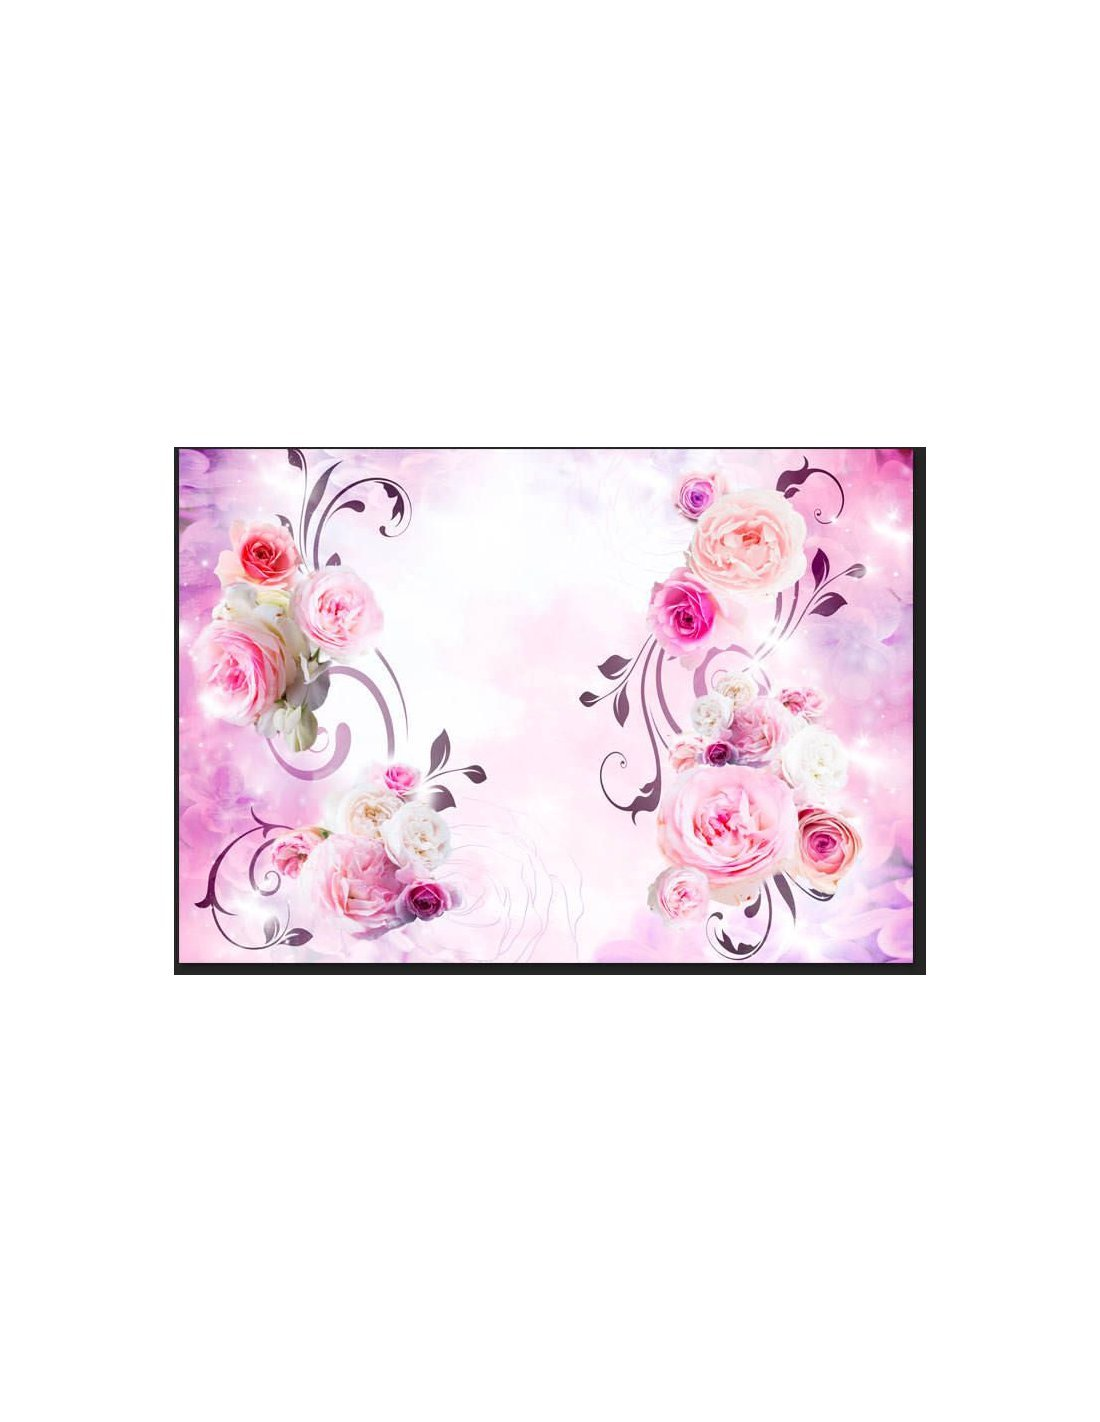 papier peint rose variations artgeist. Black Bedroom Furniture Sets. Home Design Ideas